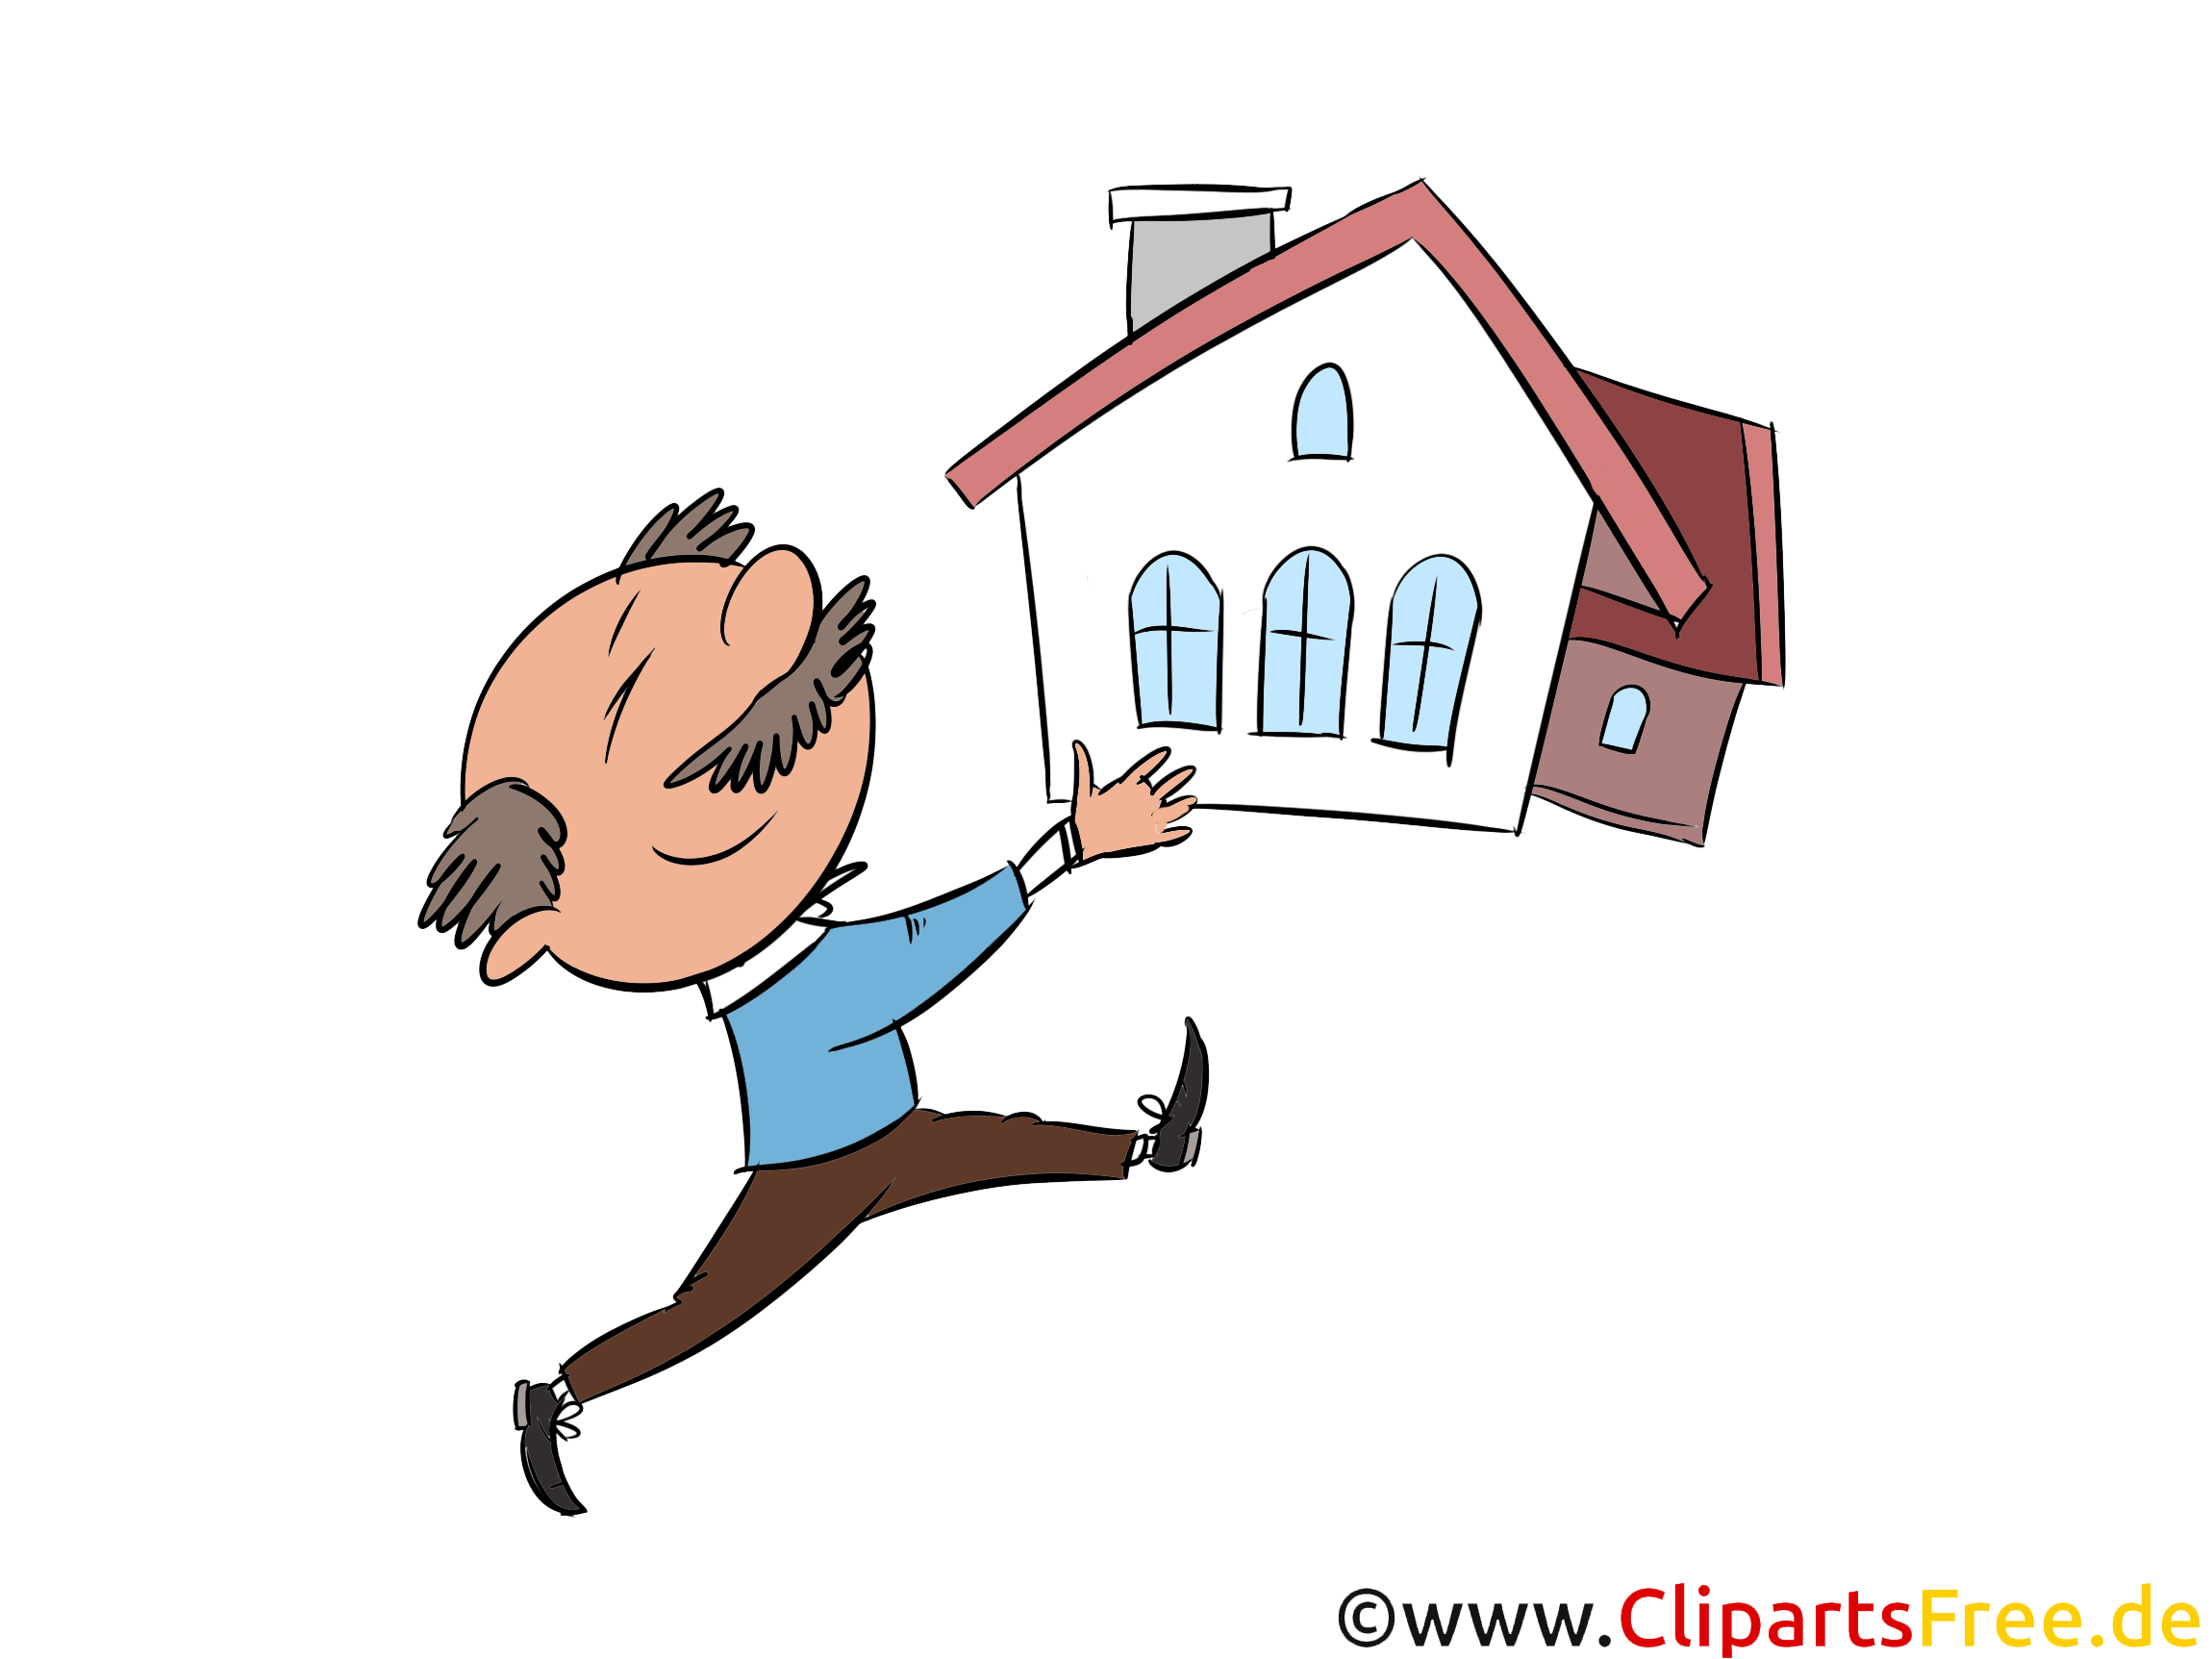 Immobilienkauf Clipart, Illustration, Bild, Grafik gratis